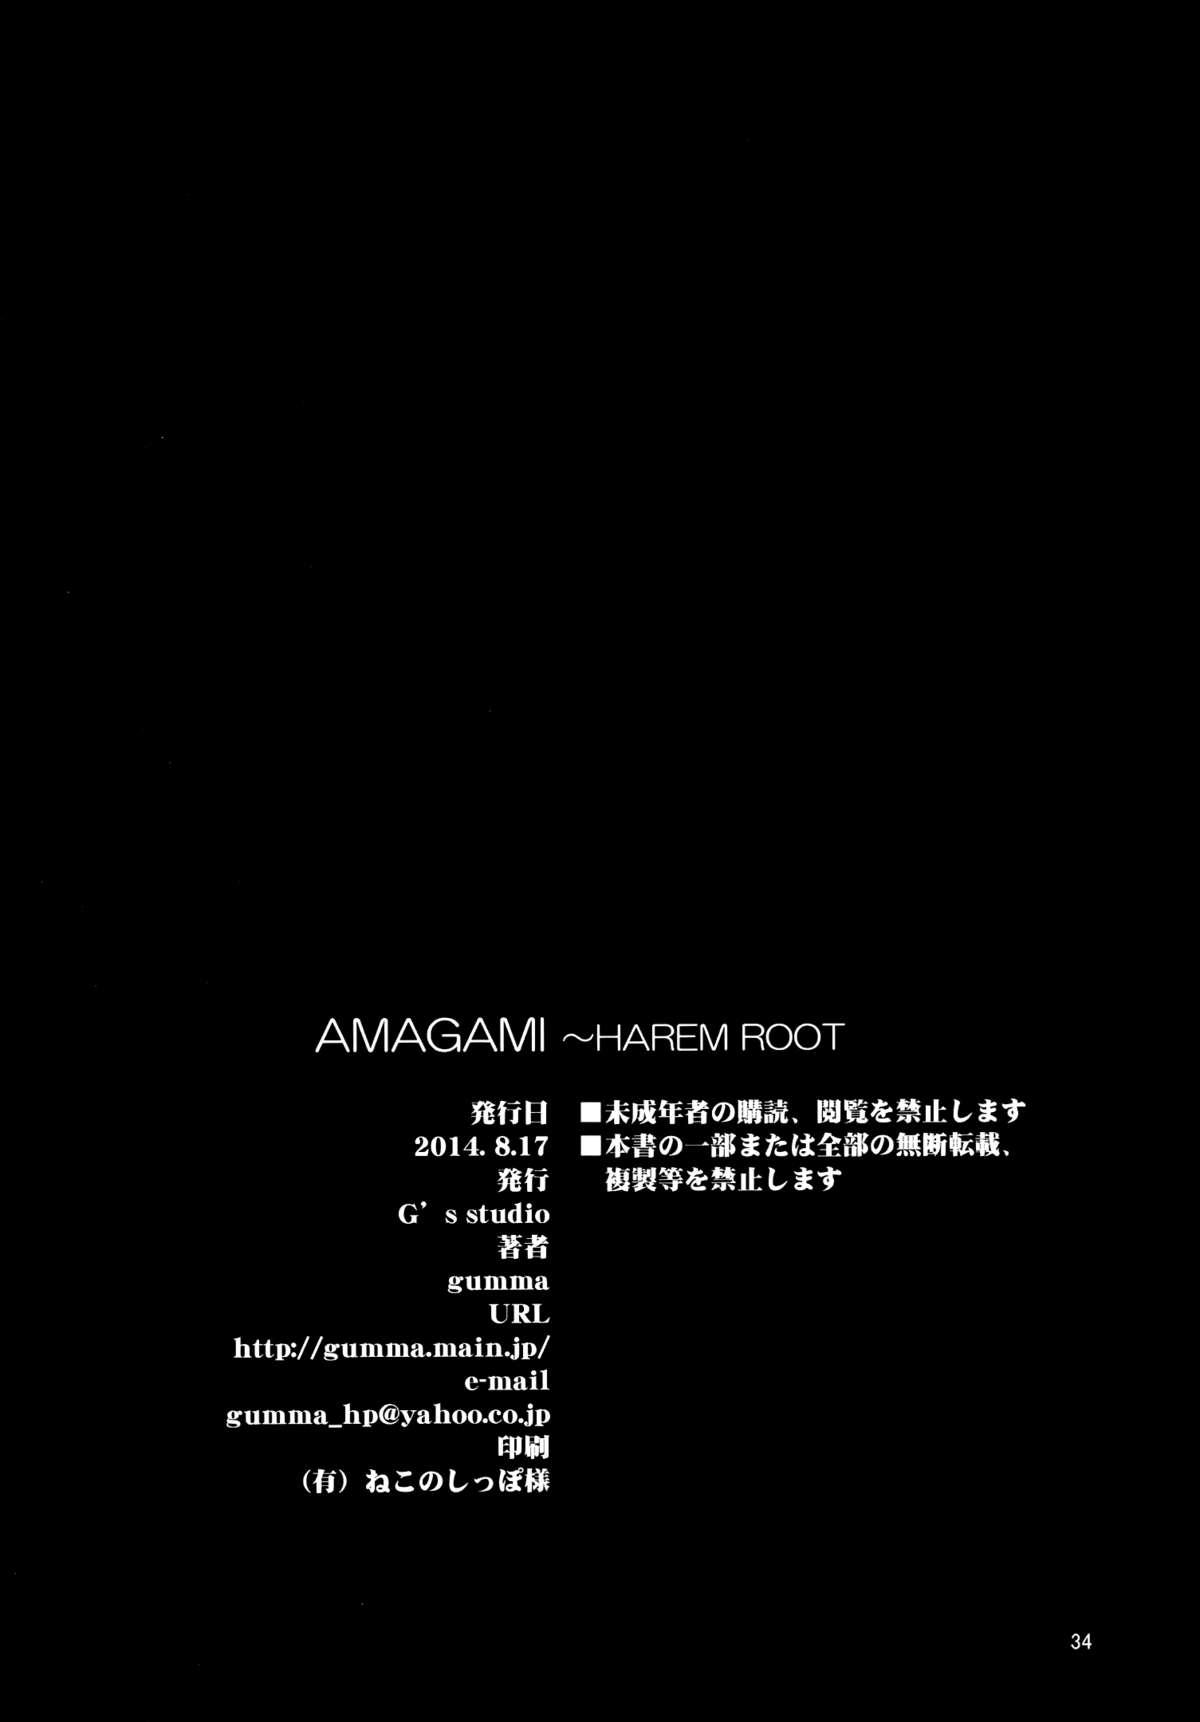 AMAGAMI ~HAREM ROOT 33